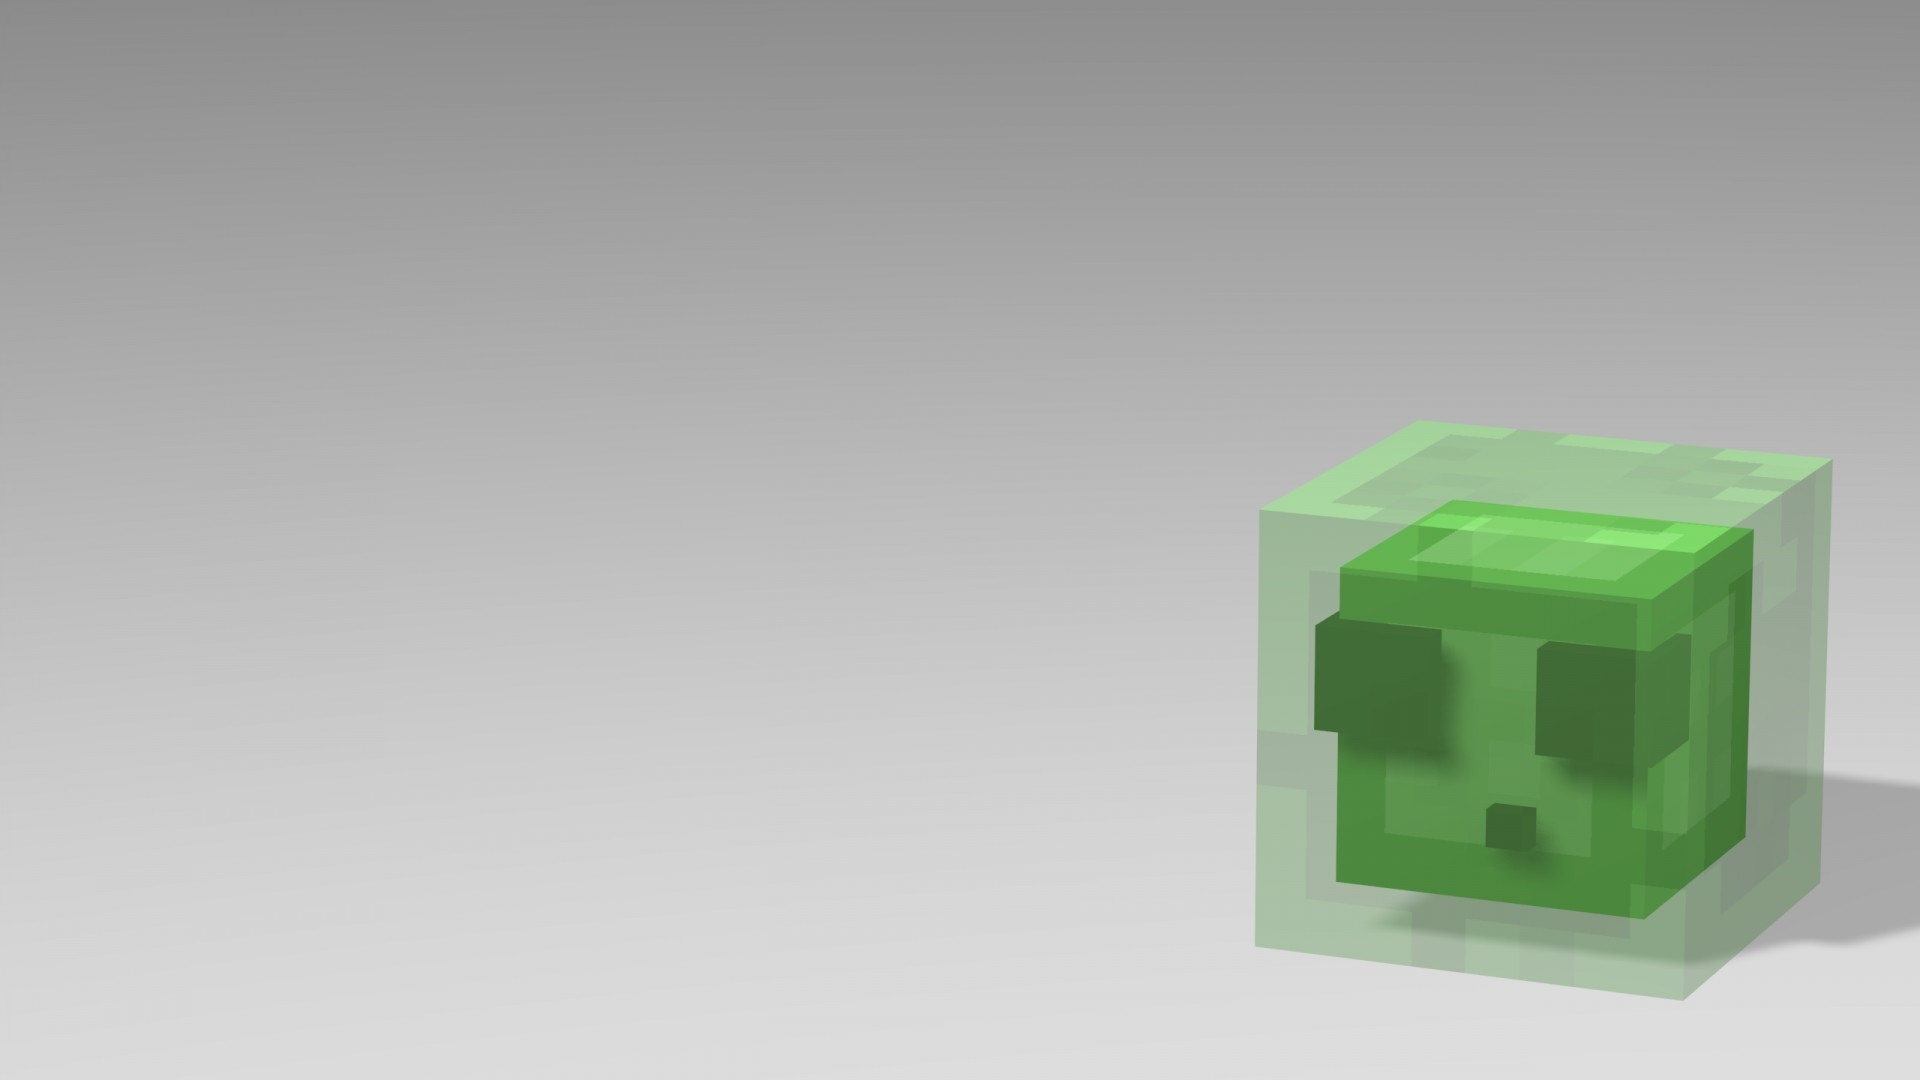 Minecraft Minimalist wallpaper for computer